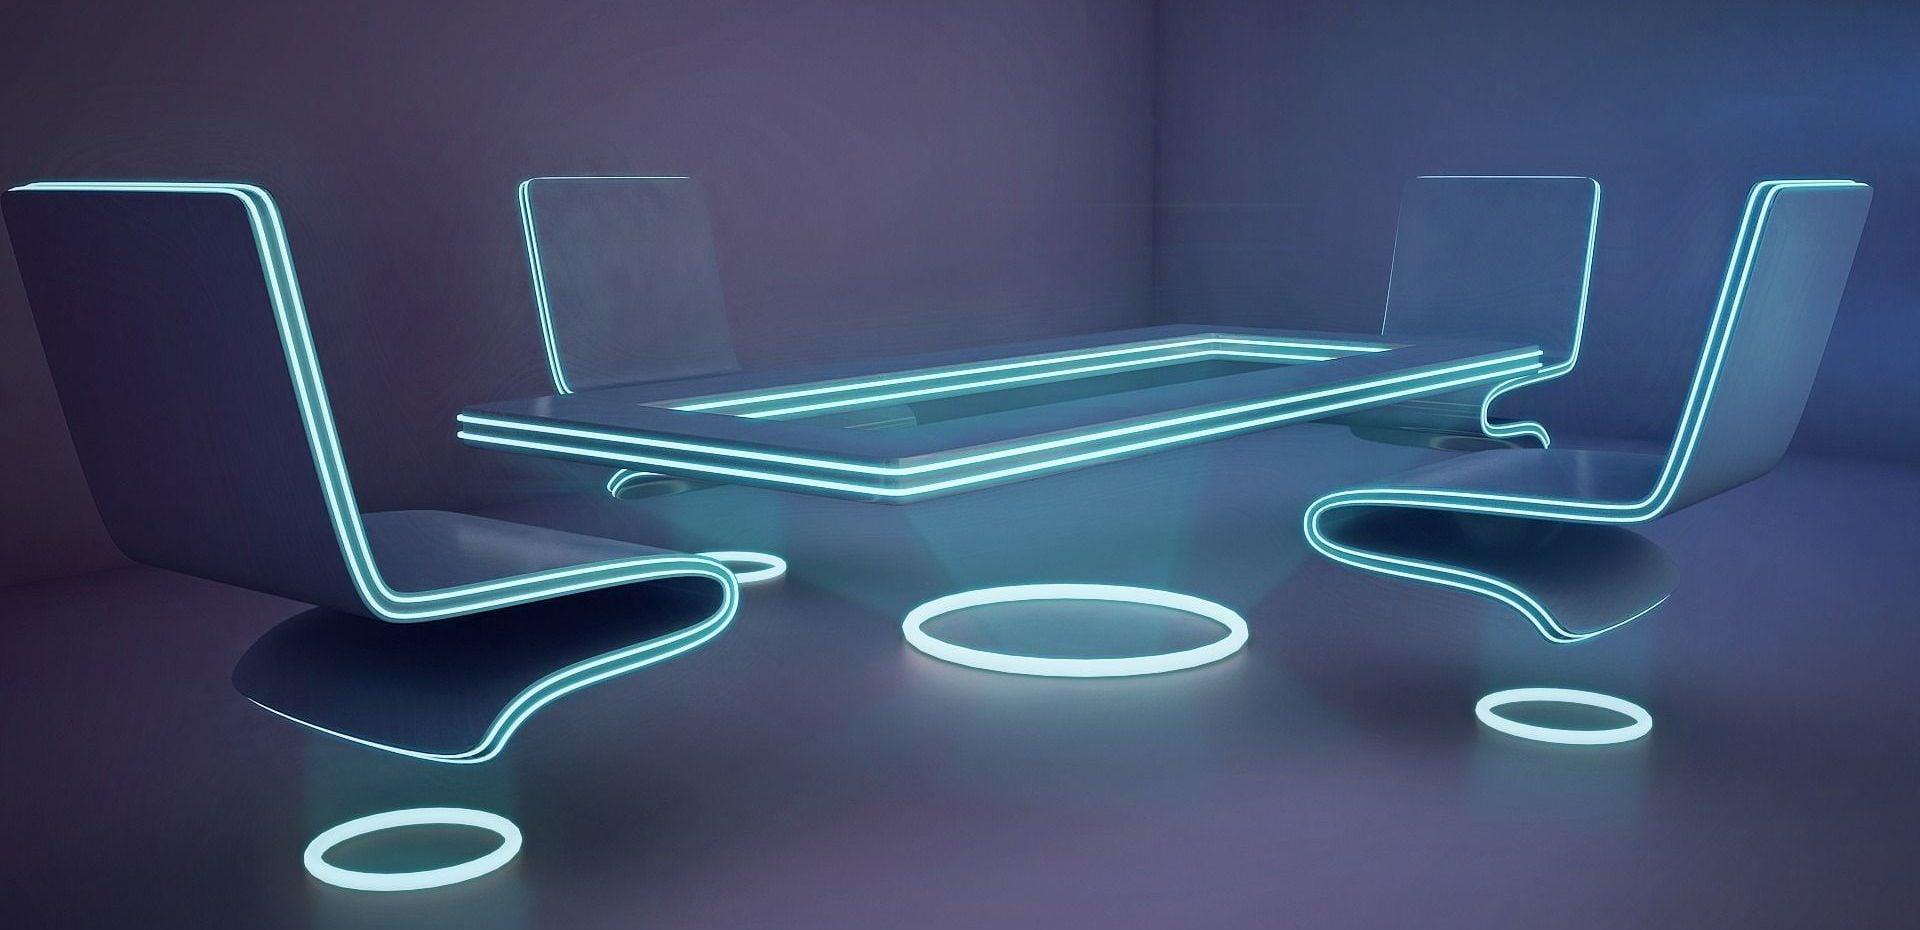 طراحی باشکوه میز تحریر